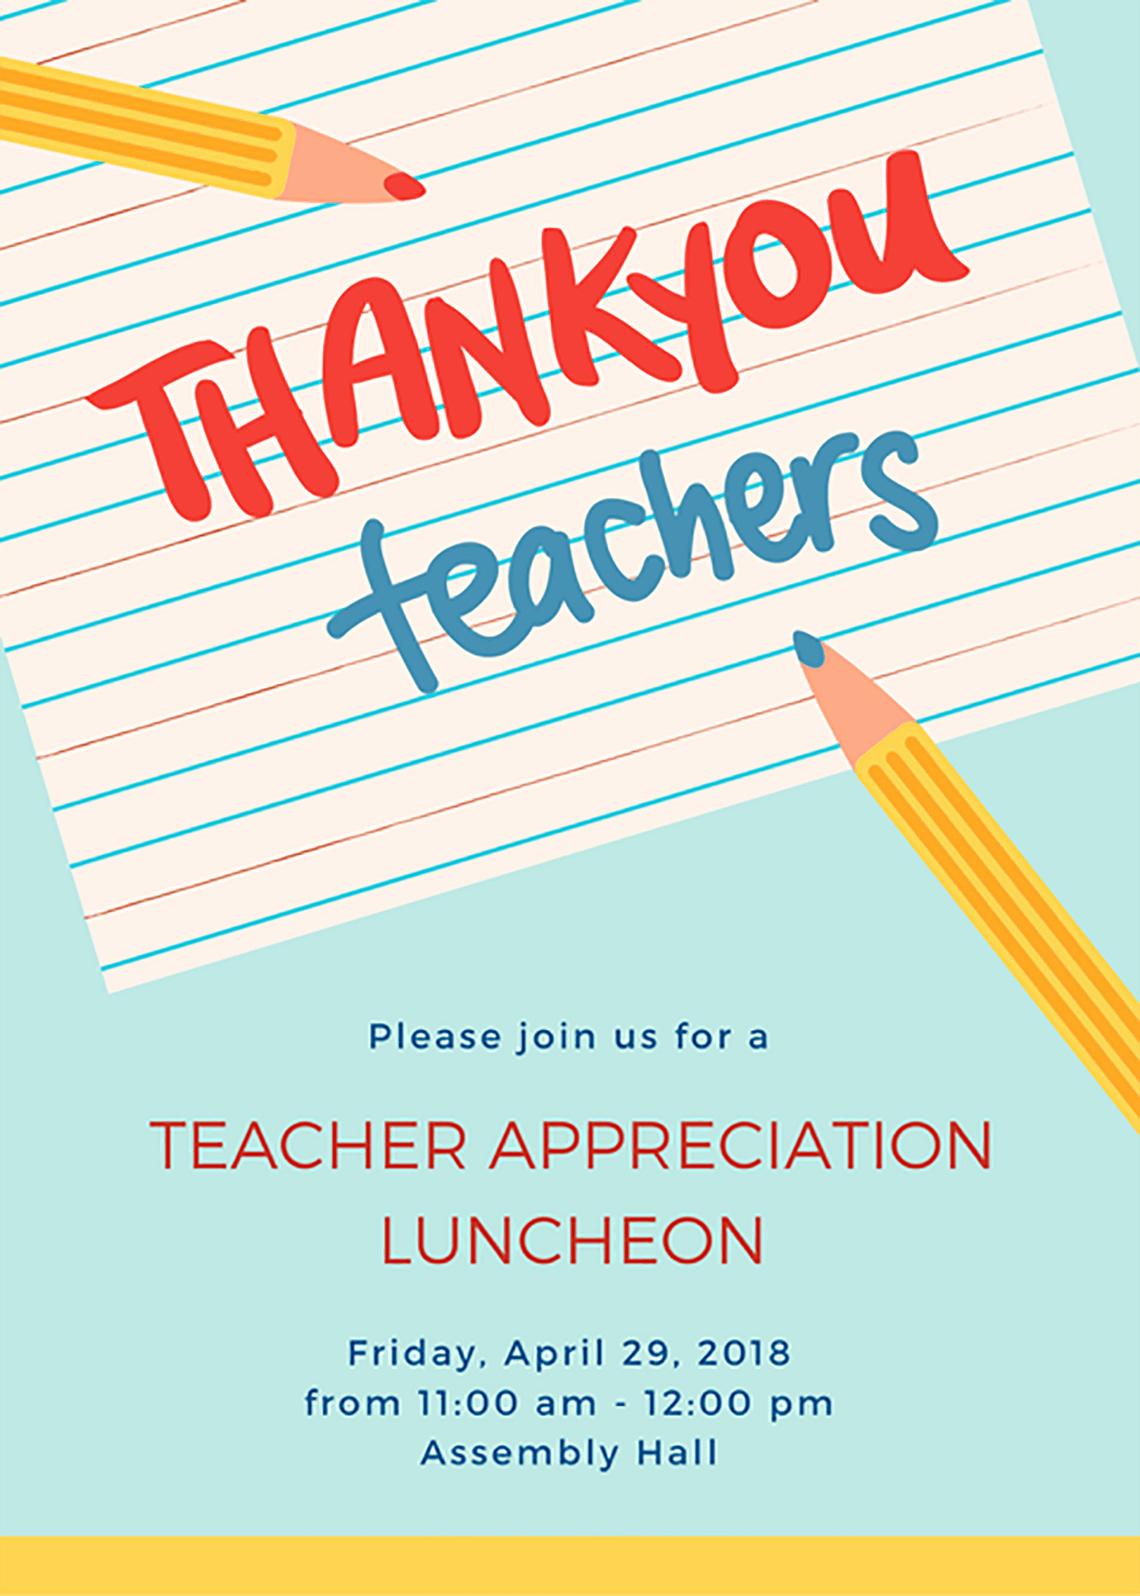 Teacher Appreciation Luncheon Invitation Lovely 30 Beautiful Teacher Appreciation Ideas Canva